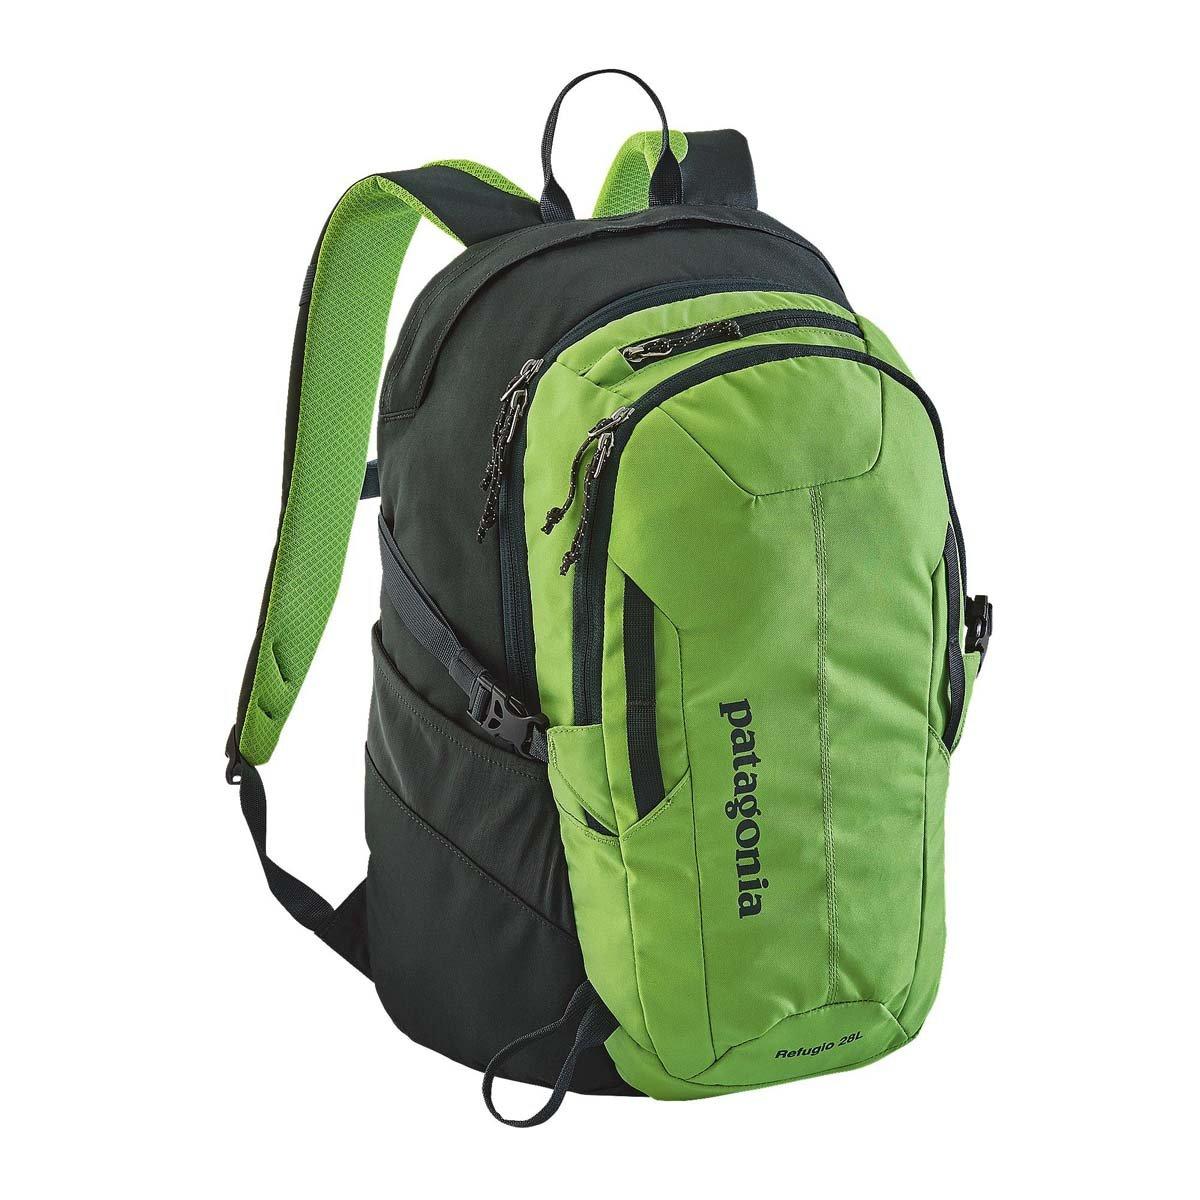 Patagonia Refugio Backpack 28L, Hydro Green 47911-HYDG